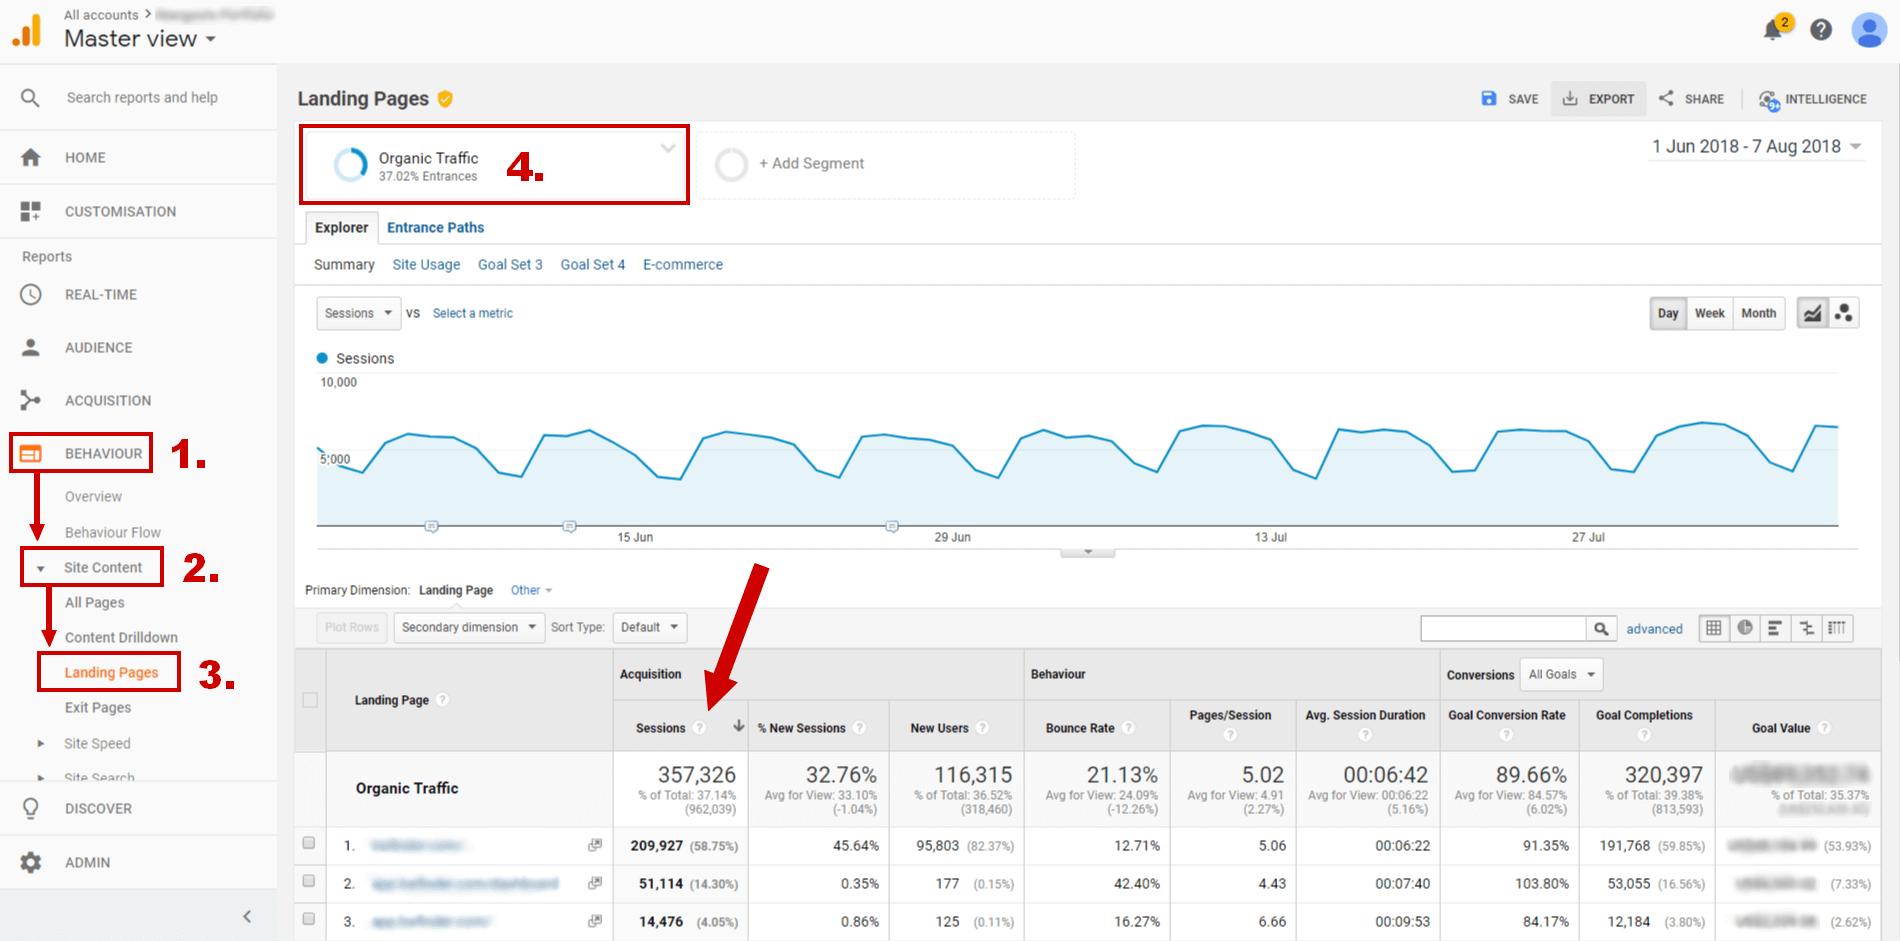 Trafic organic Google Analytics